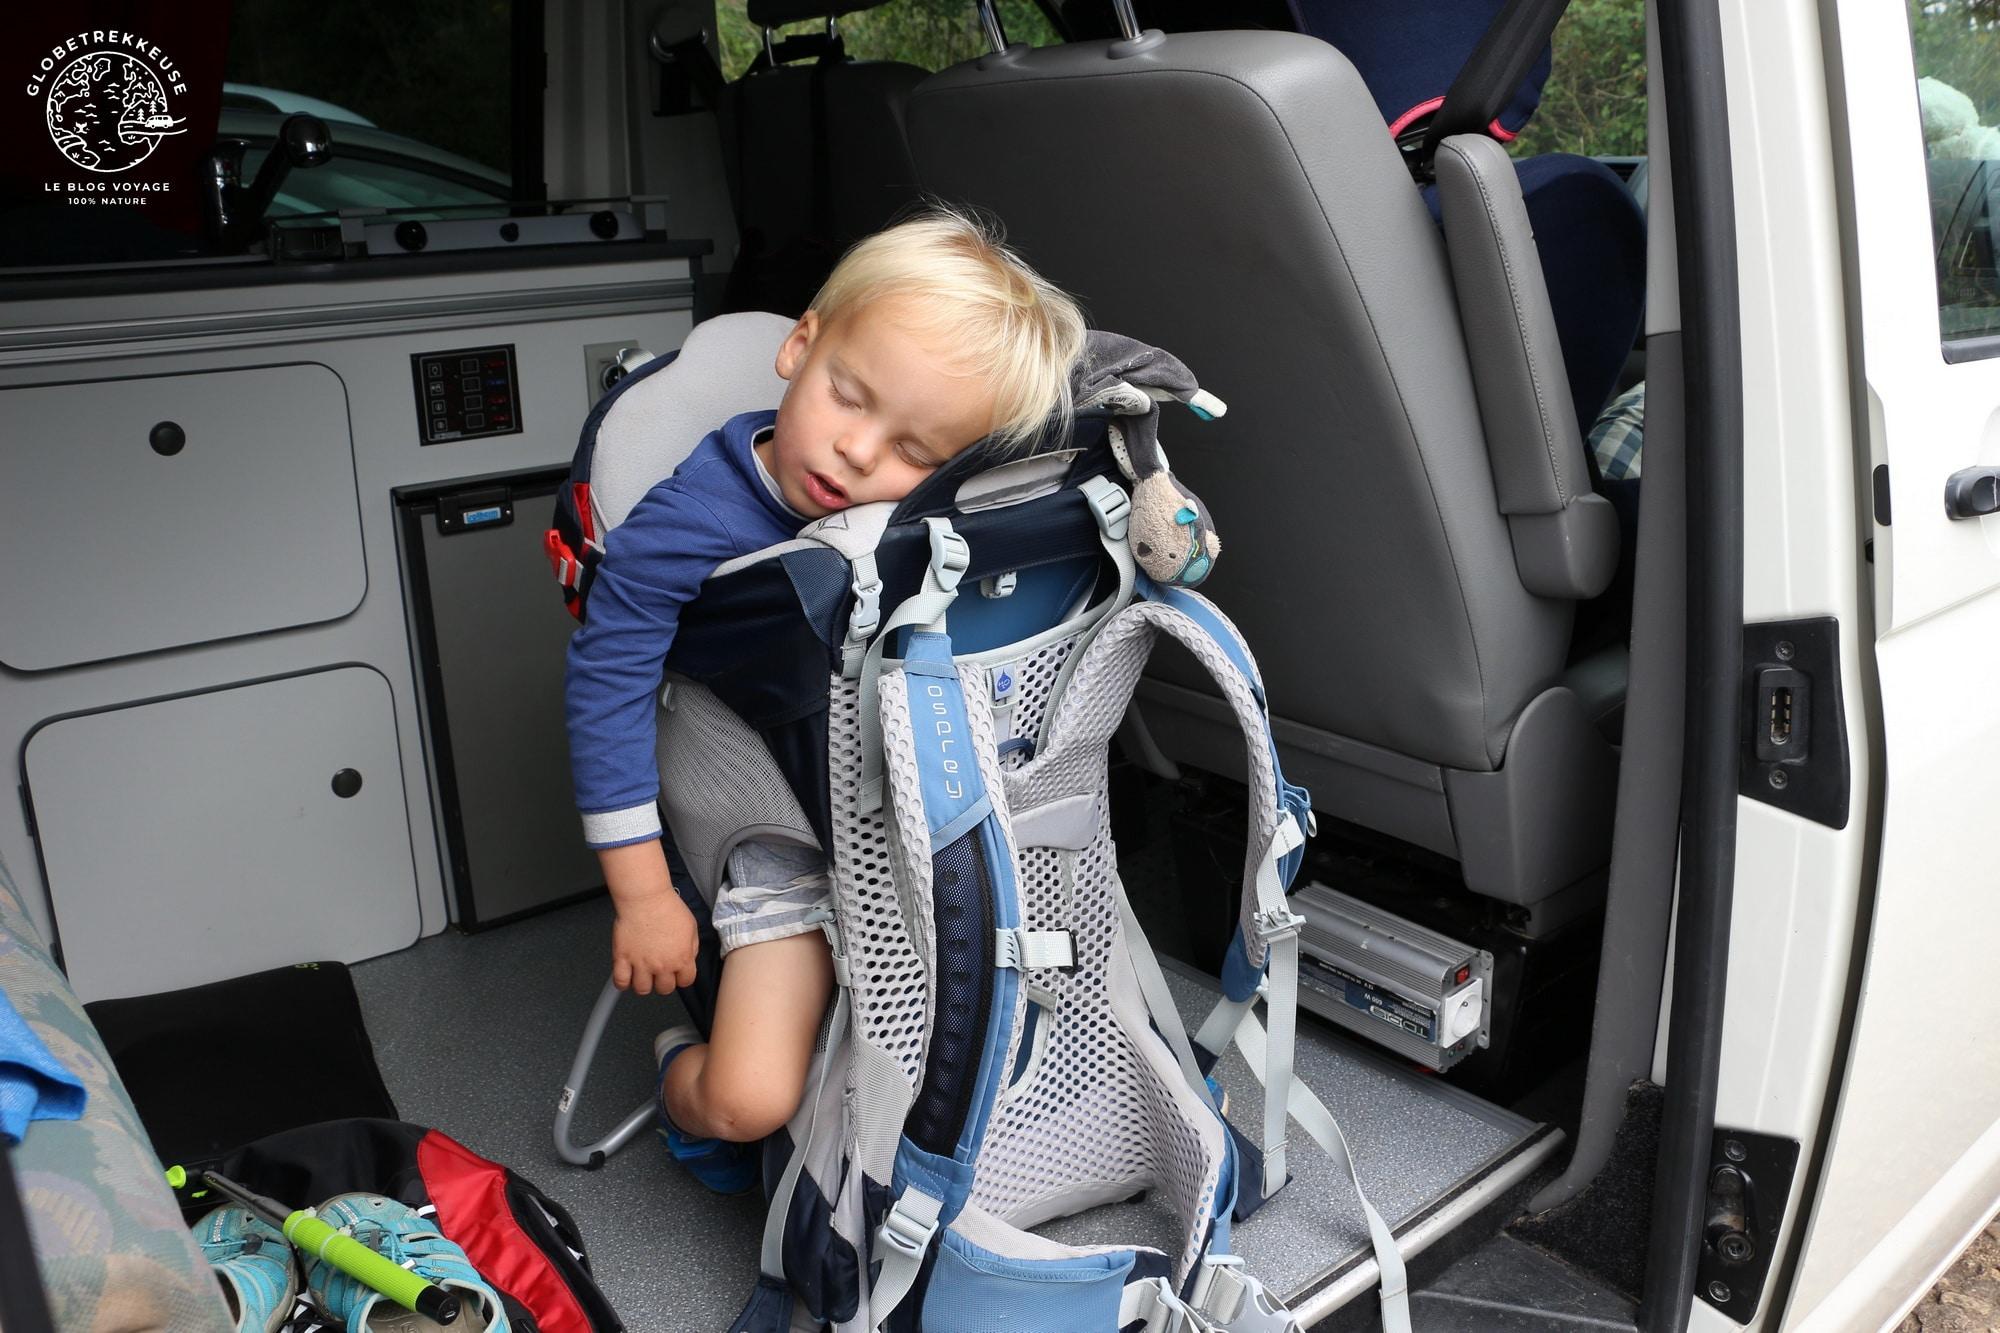 van aménagé avec enfant fatigue